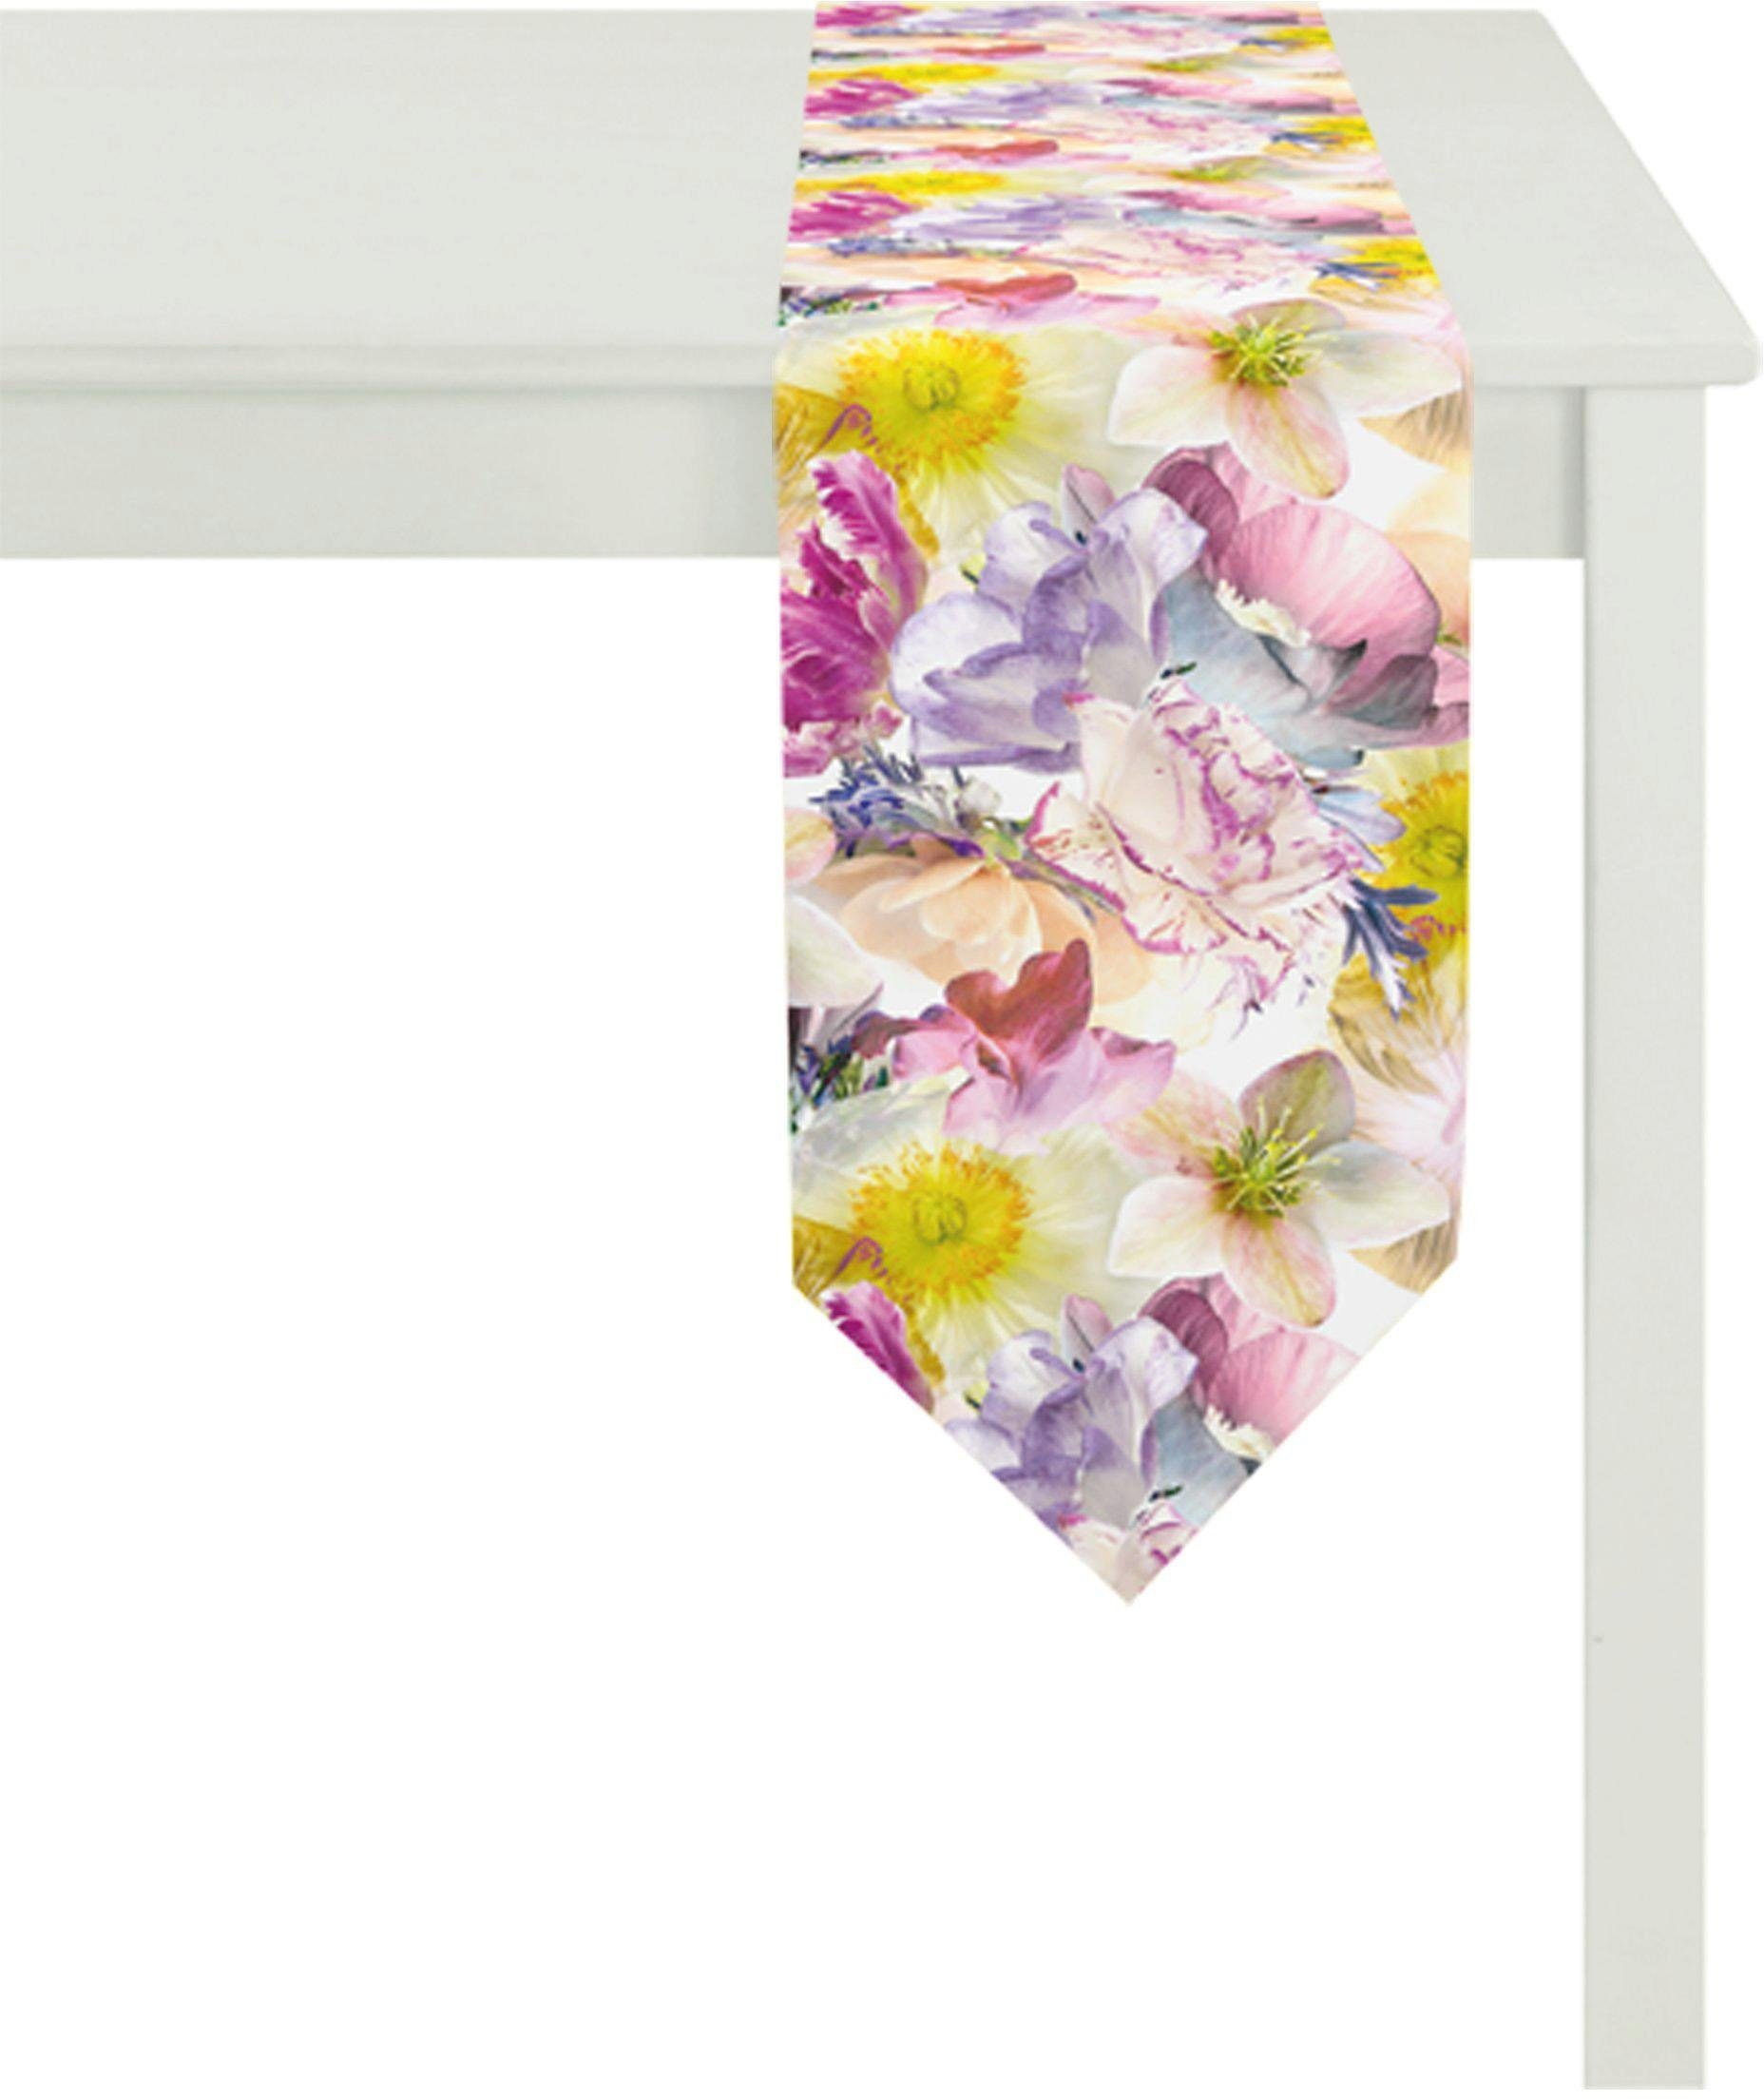 Apelt Tischband, 25x175 cm, »5306 SPRINGTIME«